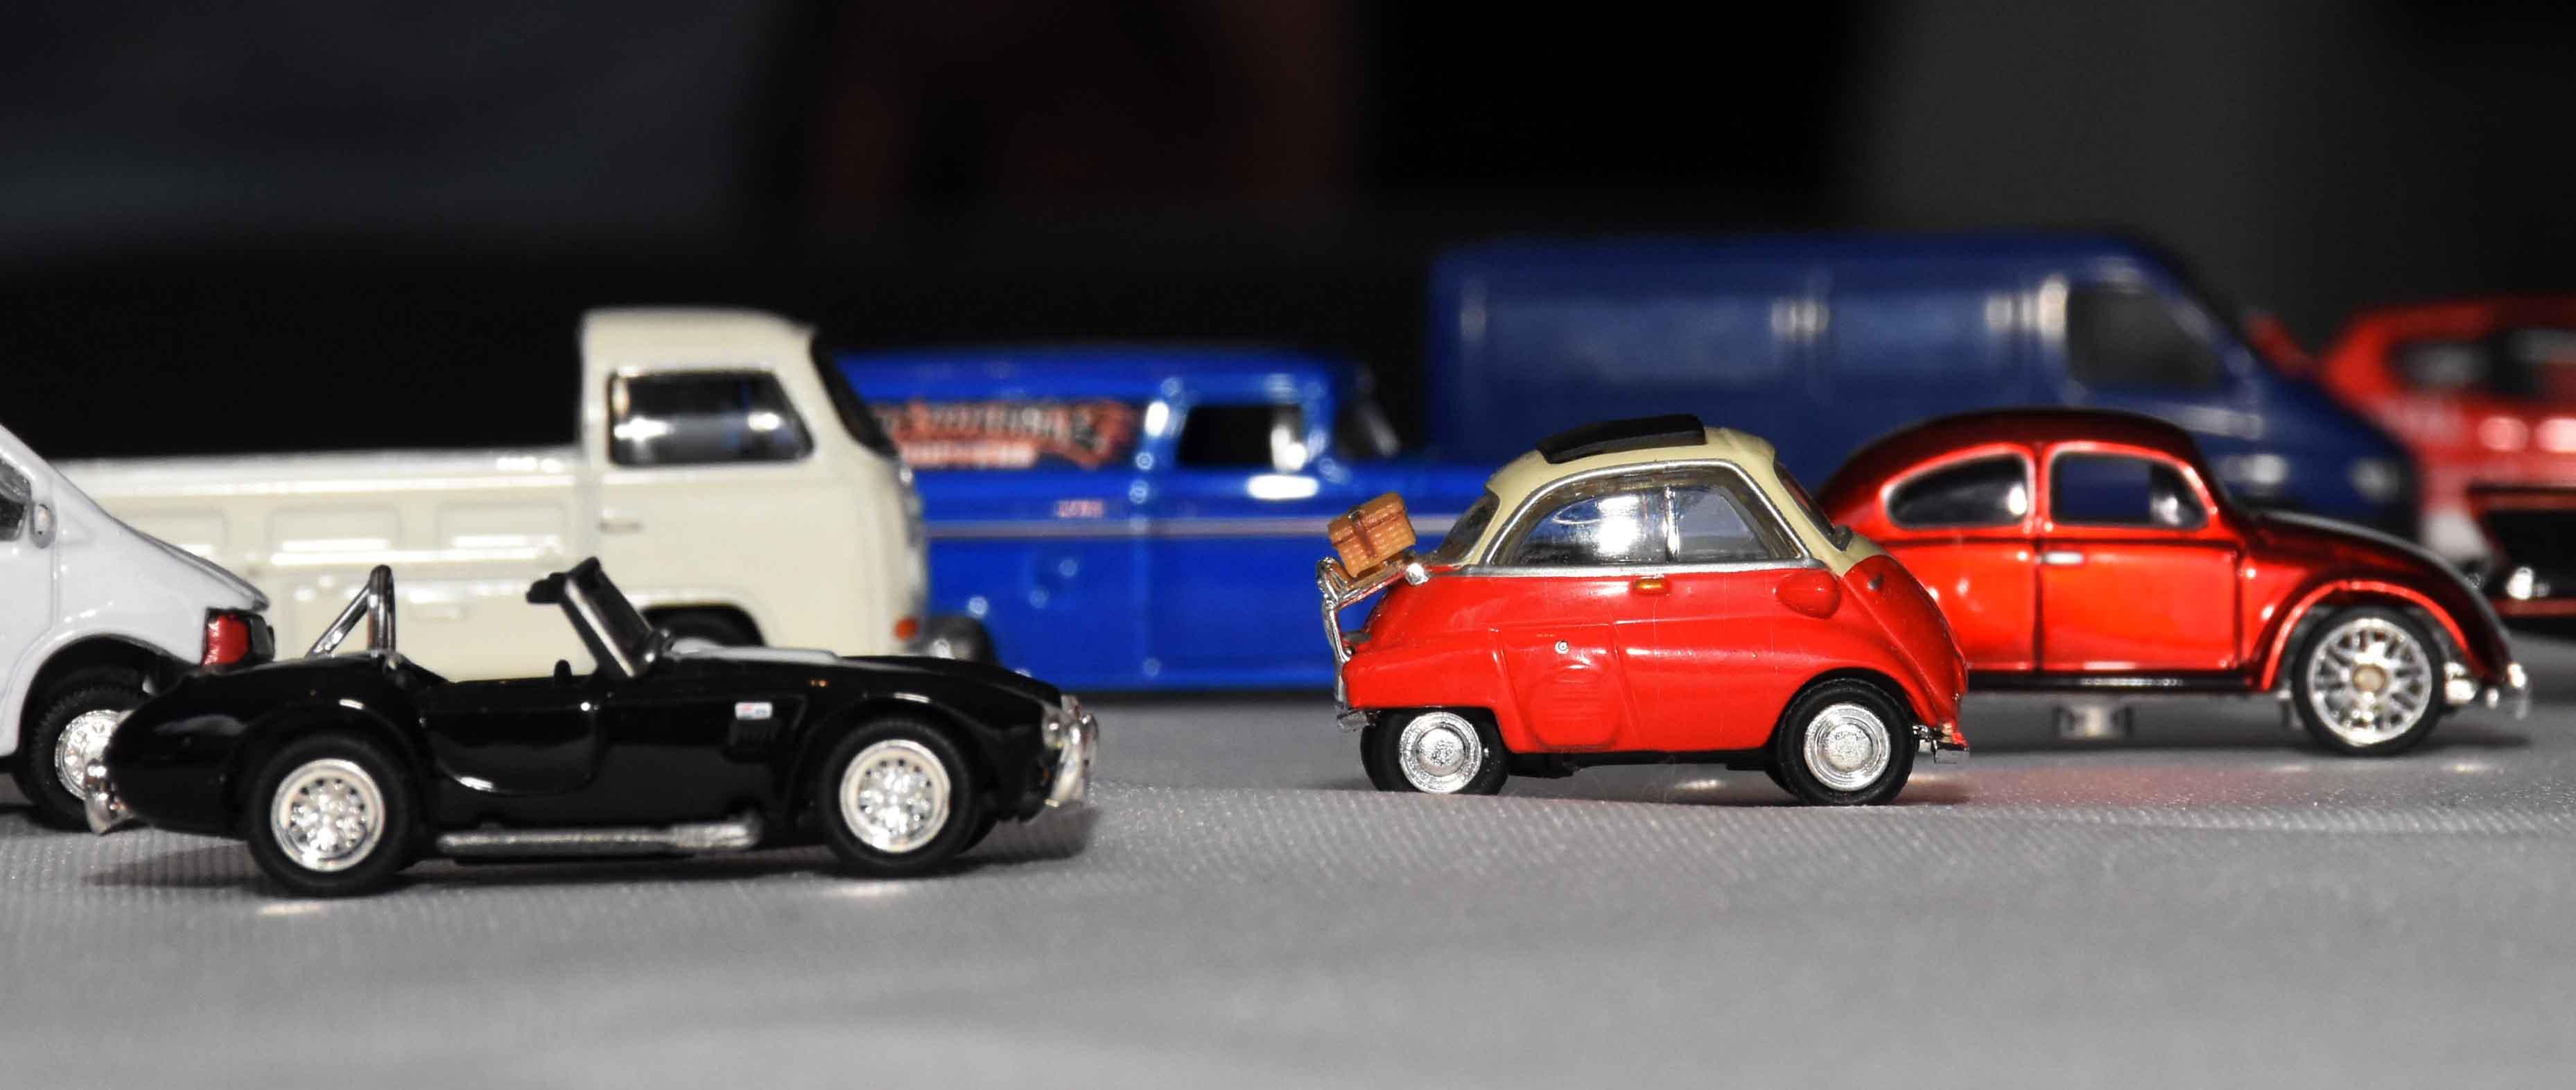 Exposición de autos a escala en La Barraca (28)